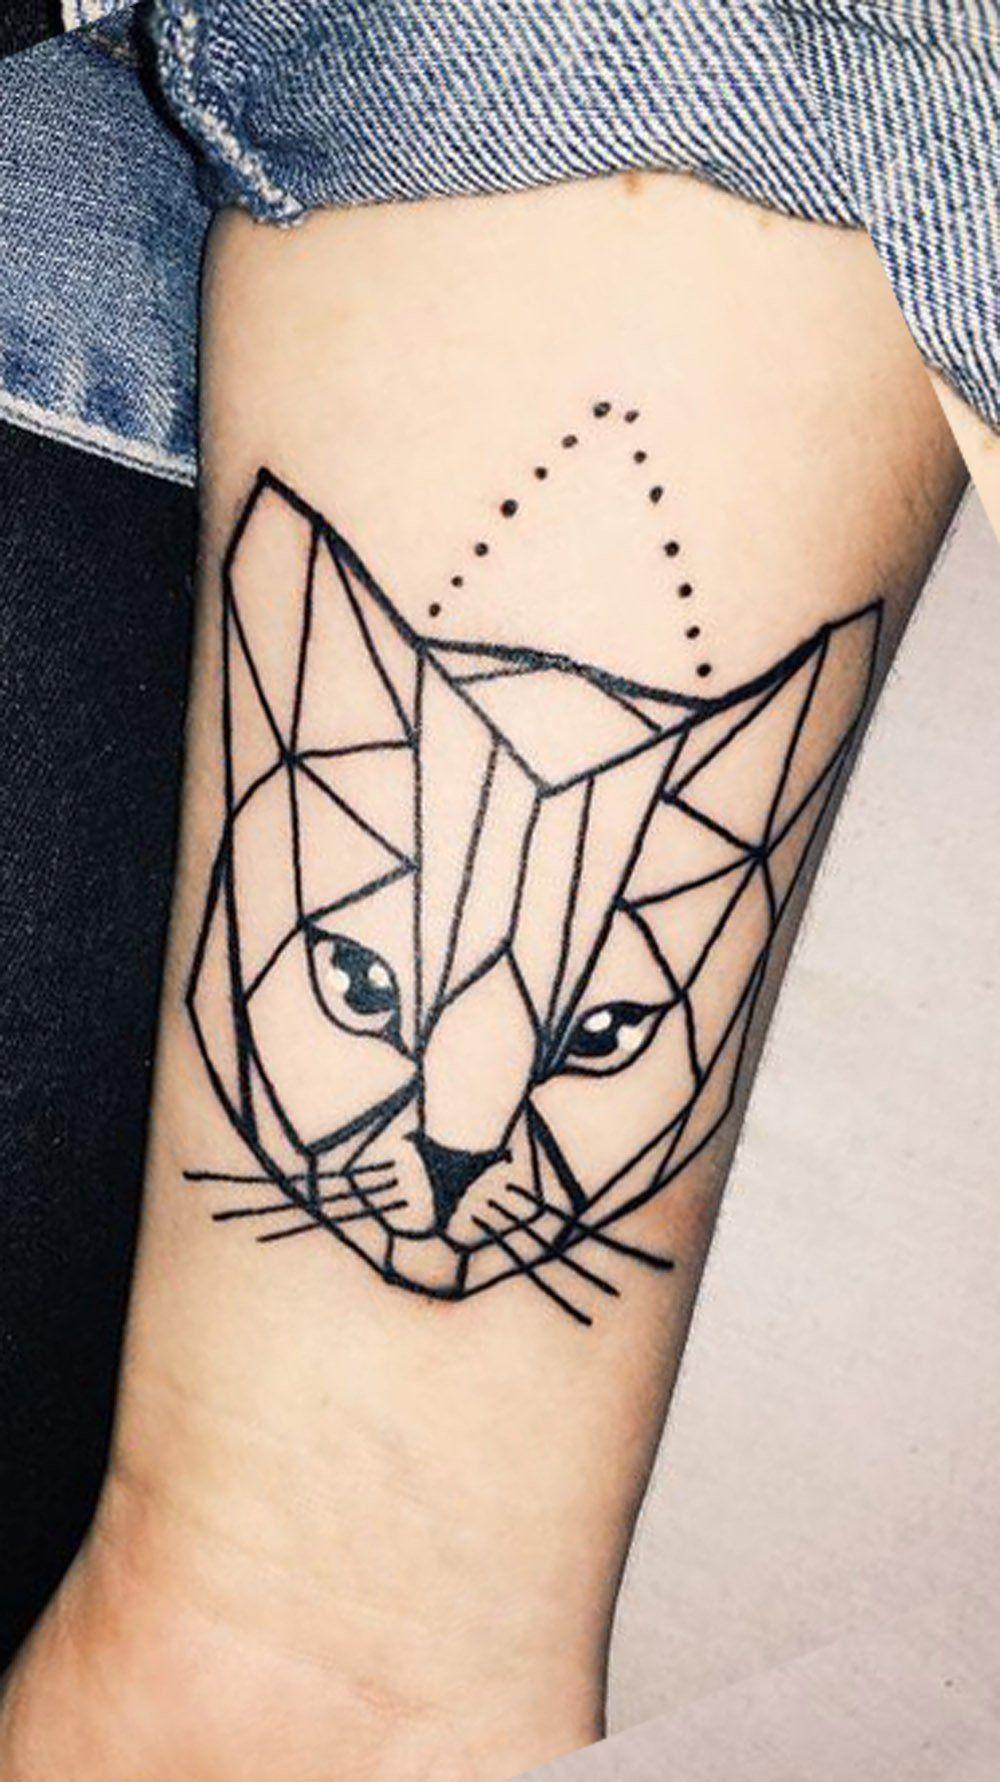 9342d70adc5e5 Geometric Cat Forearm Tattoo Ideas for Women - Cool and Unique Arm Wrist  Tat - www.MyBodiArt.com